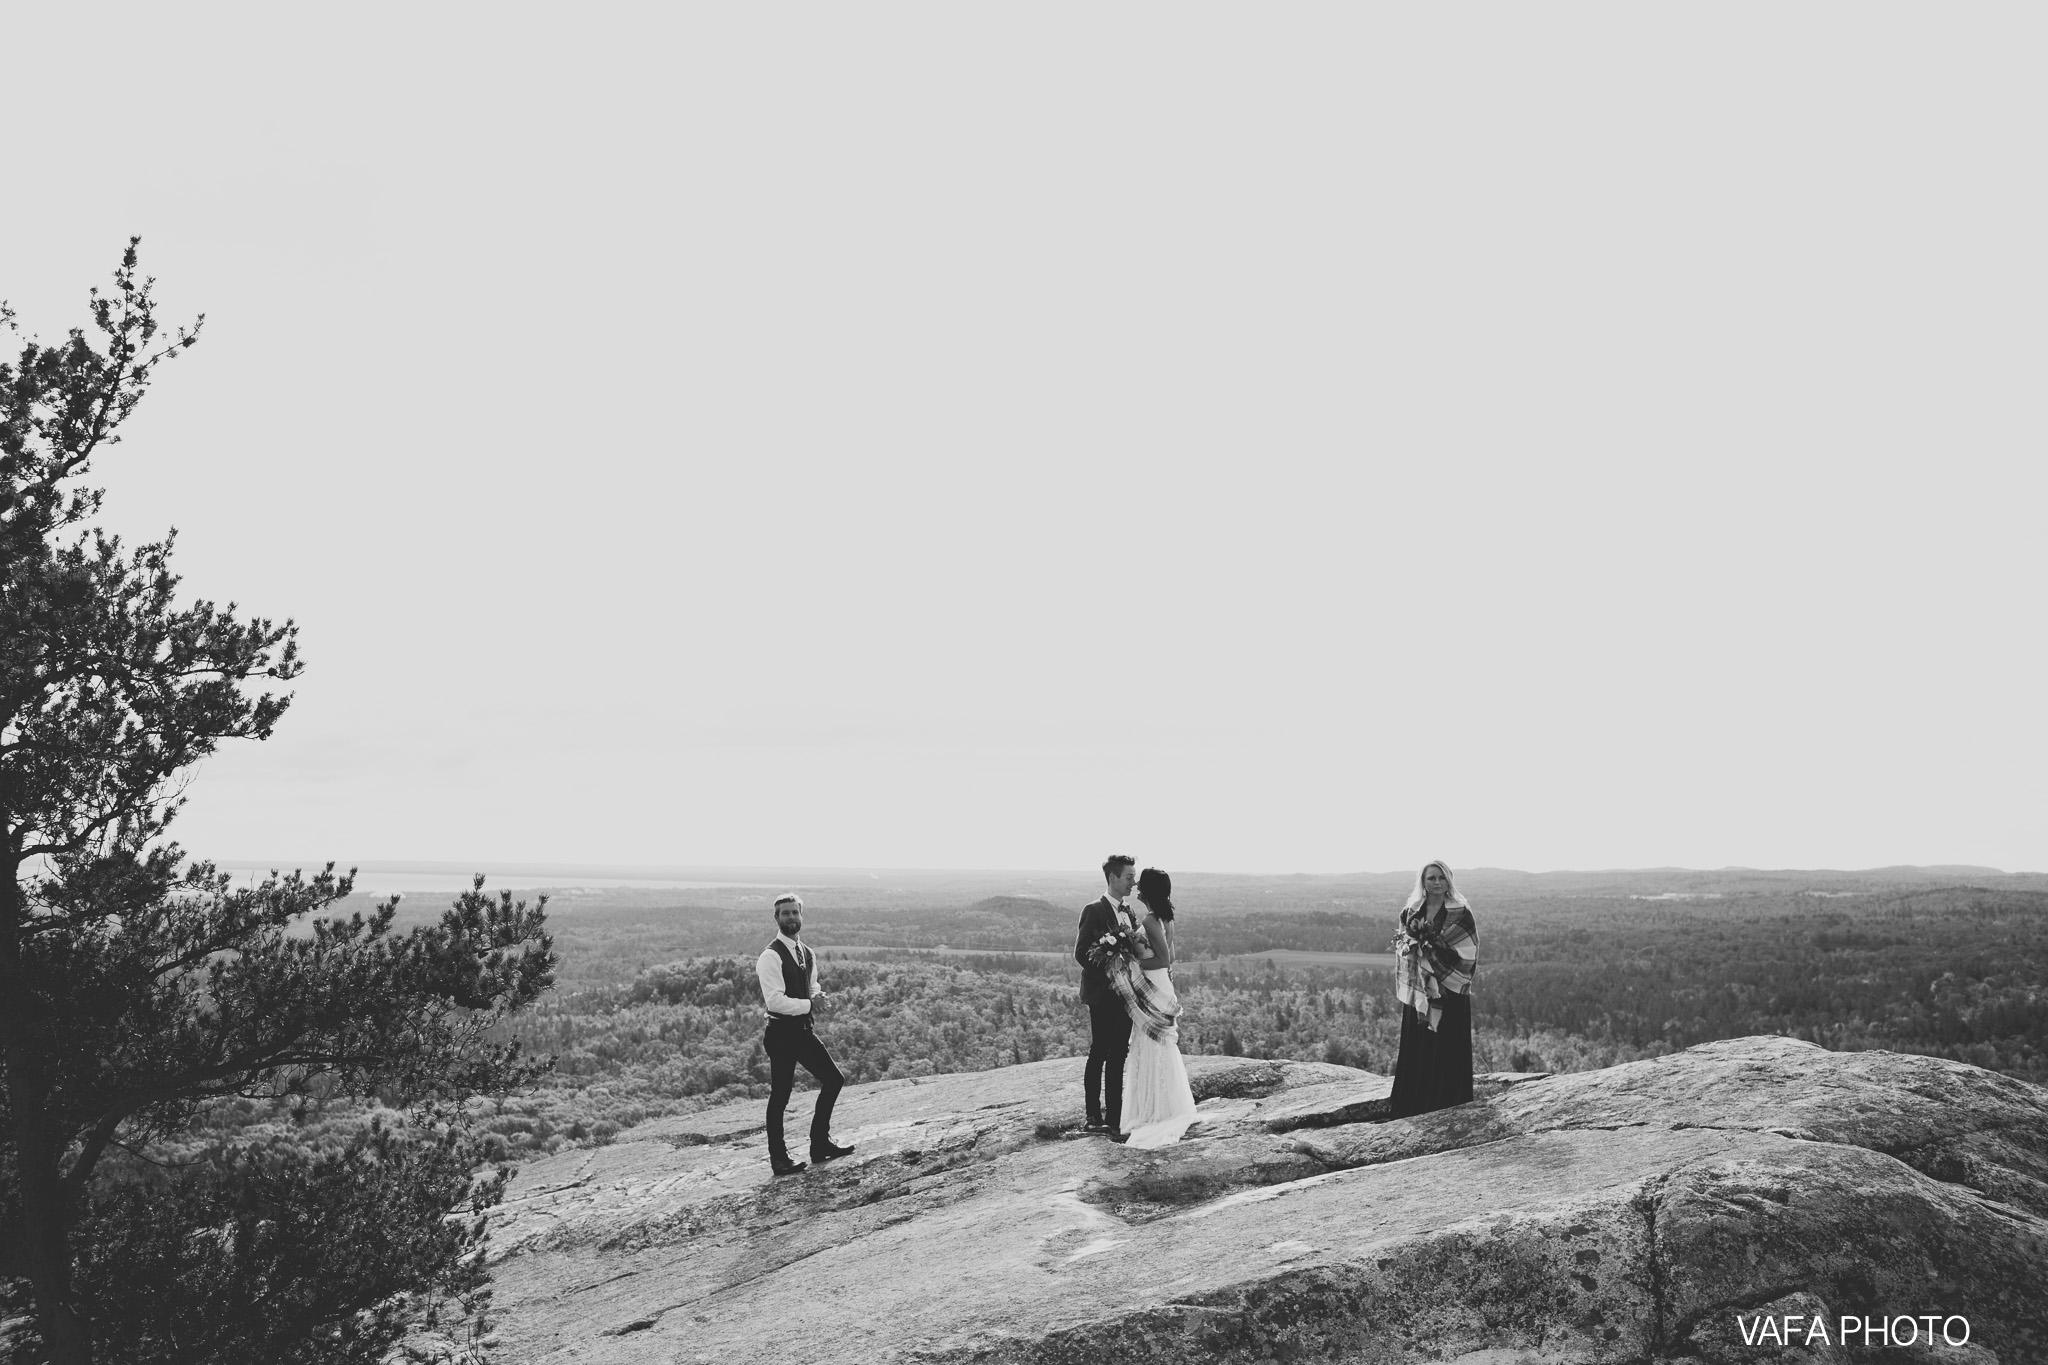 Hogback-Mountain-Wedding-Chelsea-Josh-Vafa-Photo-390.jpg